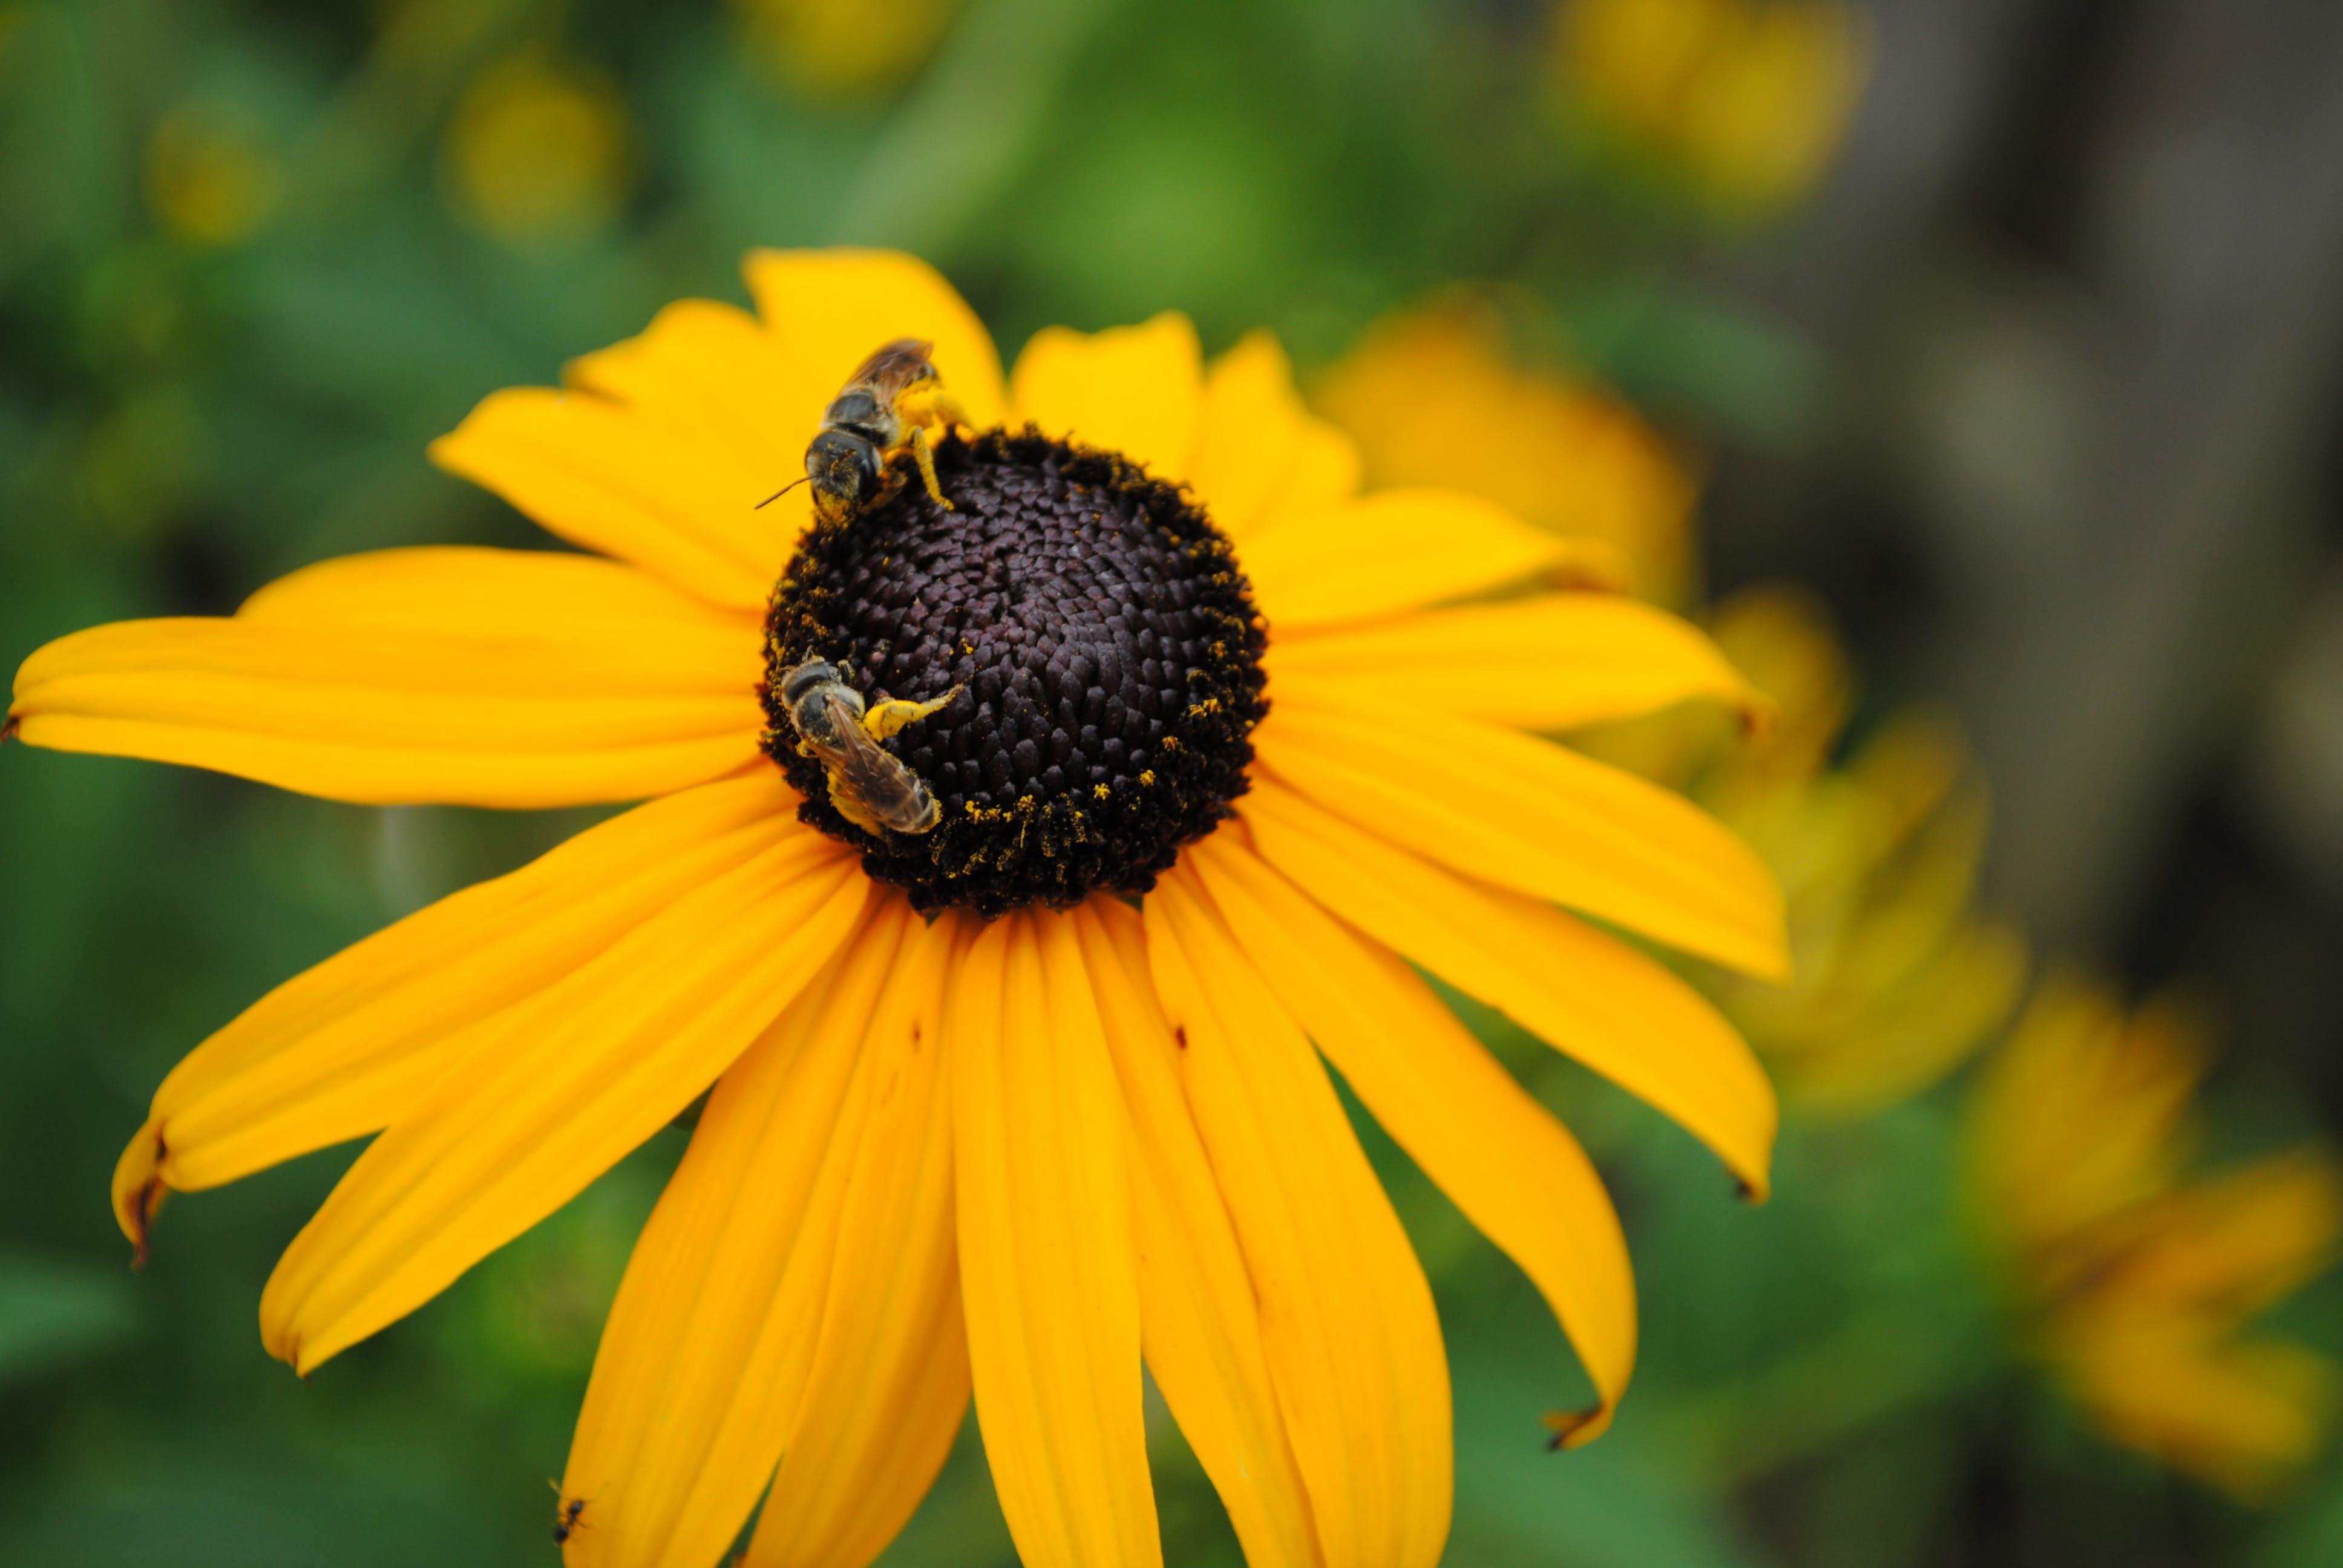 Closeup Photo of Yellow Sunflower in Bloom